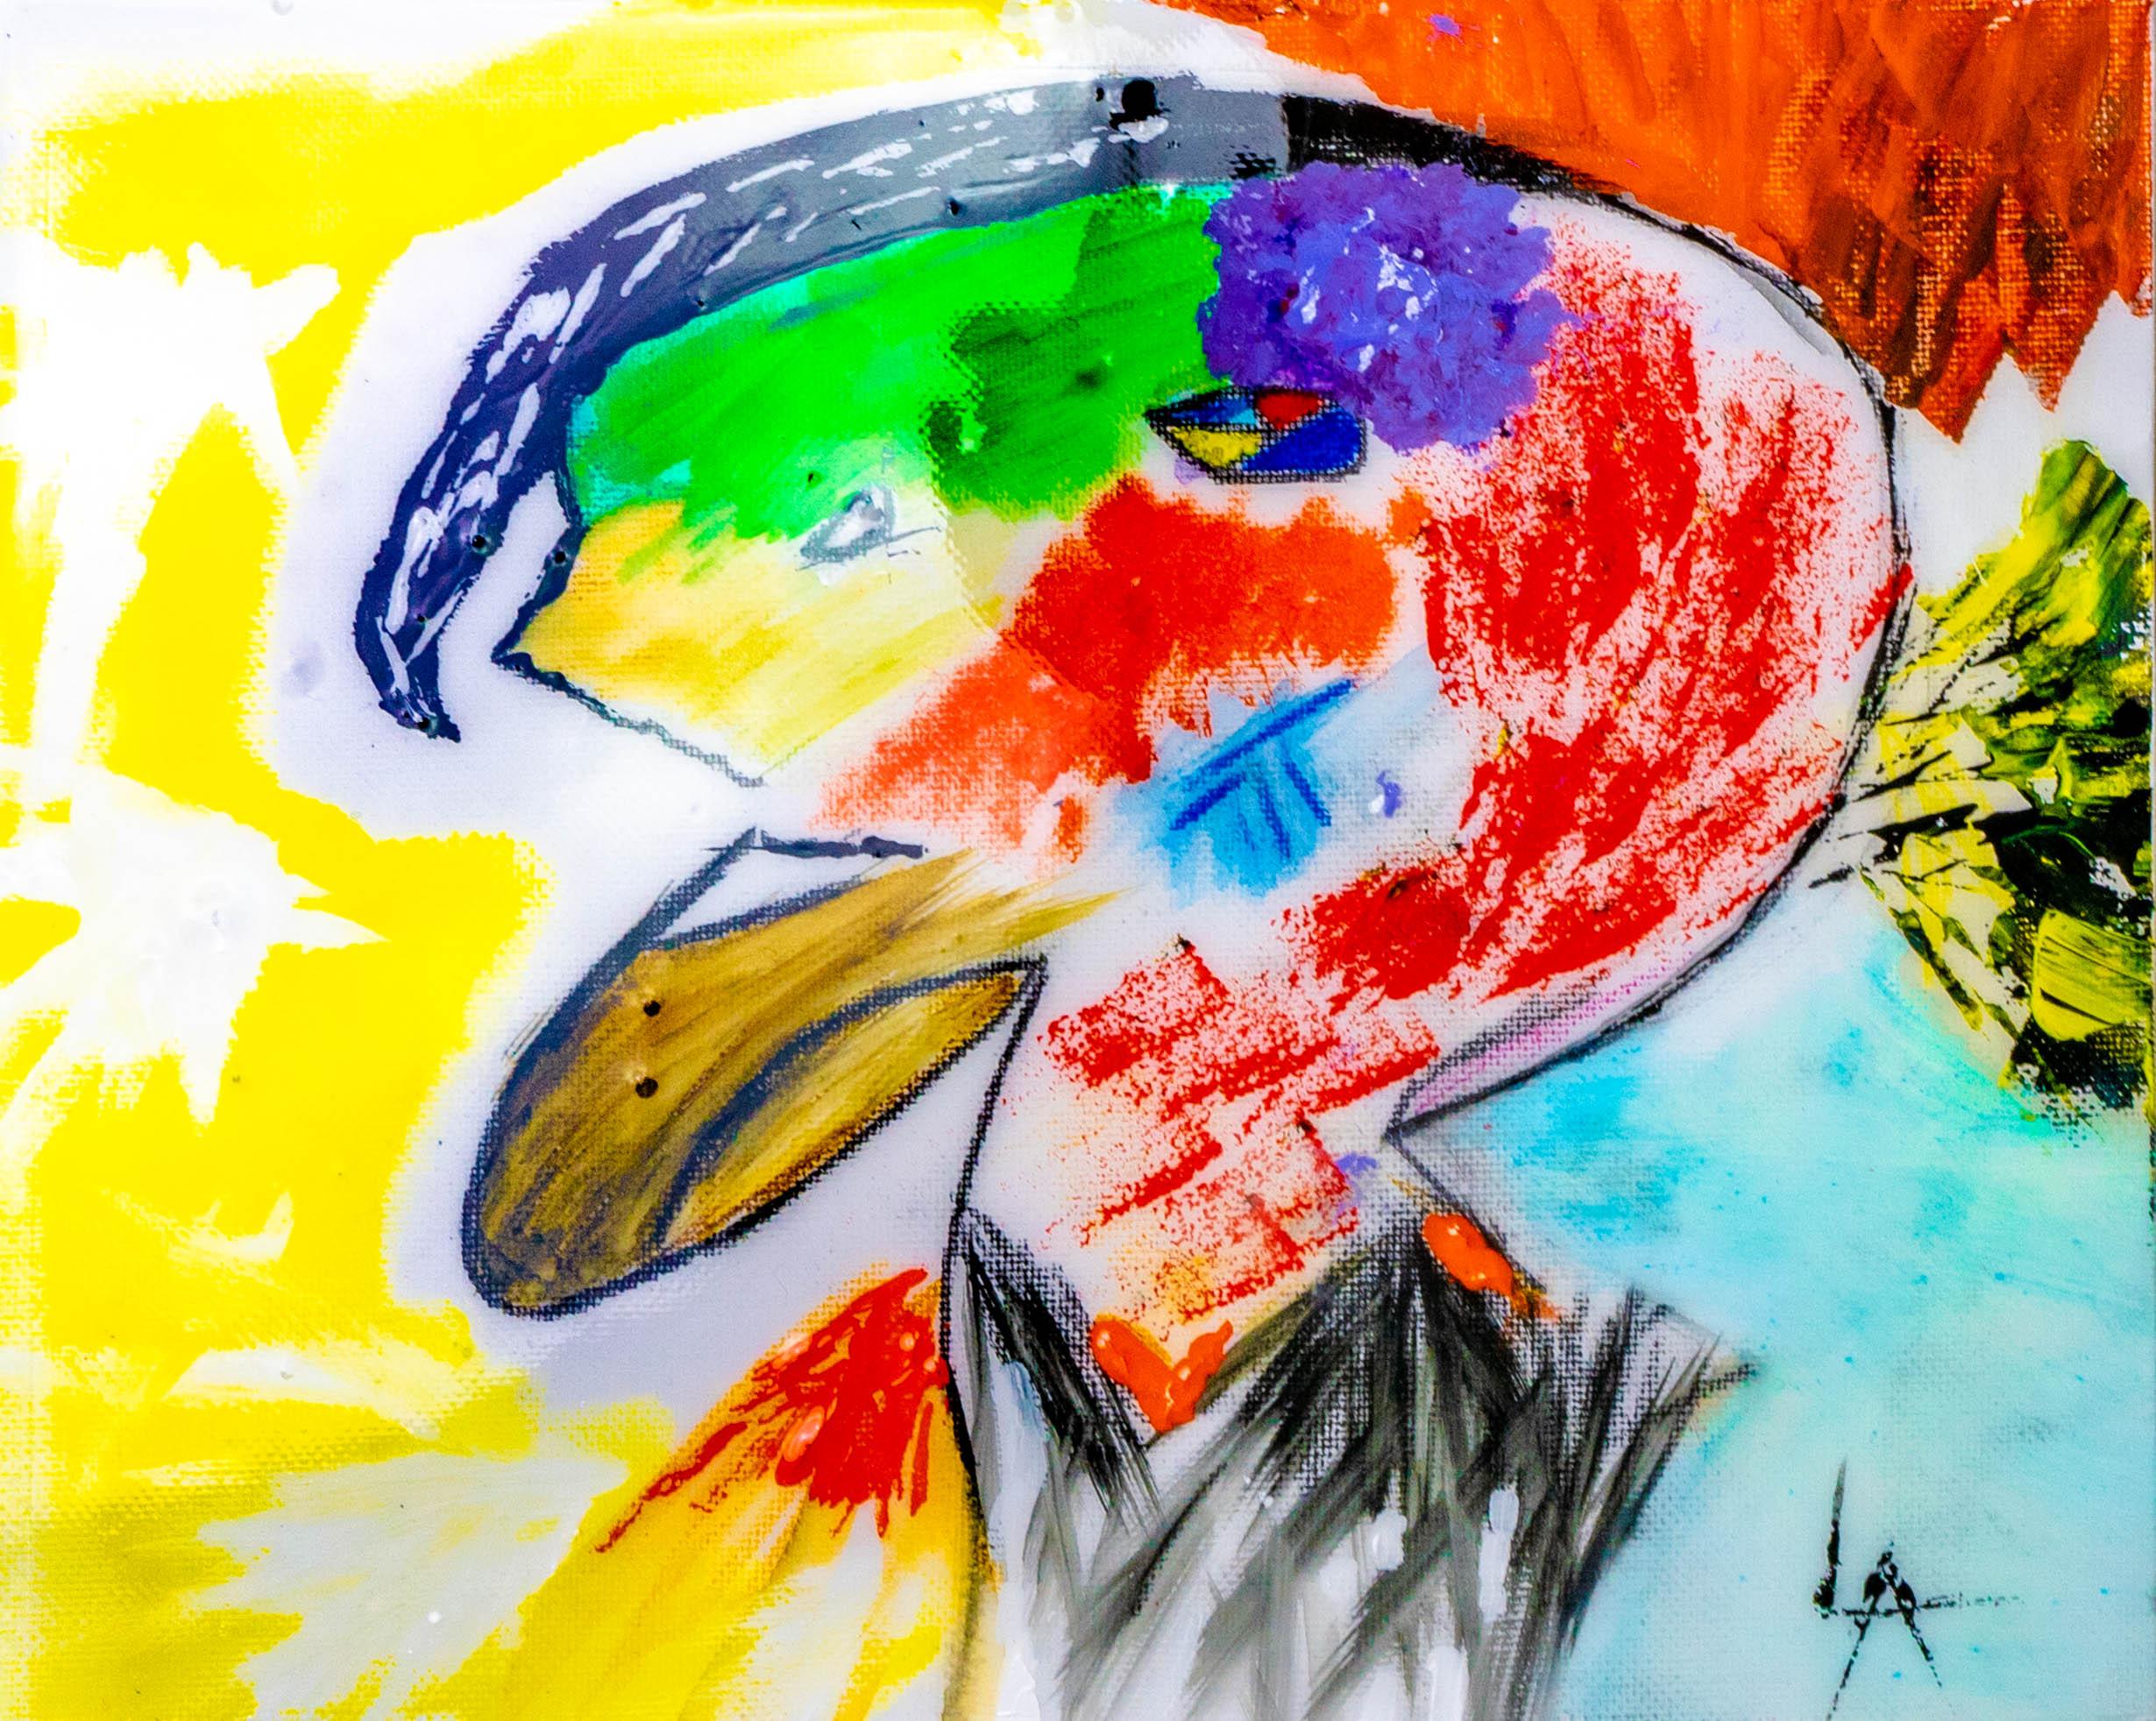 Louis Angel__Heart You__8_x10_ Canvas_Watercolors_Acrylic_Resin_2019 _$250.jpg